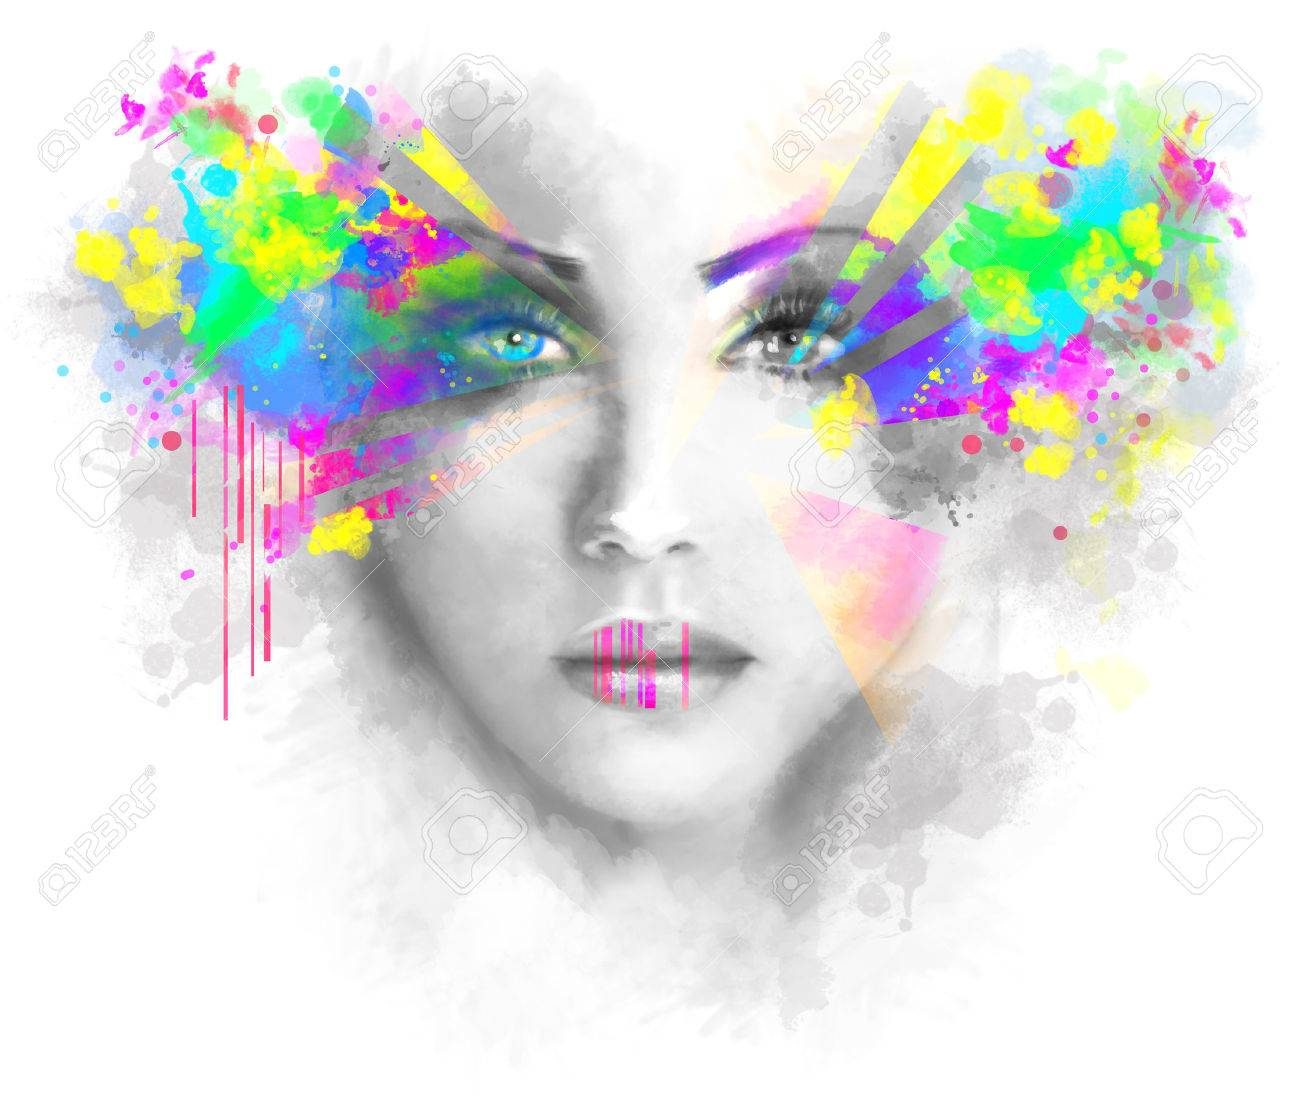 Multicolored abstractn Woman Beautiful portrait illustration Stock Photo - 46114846